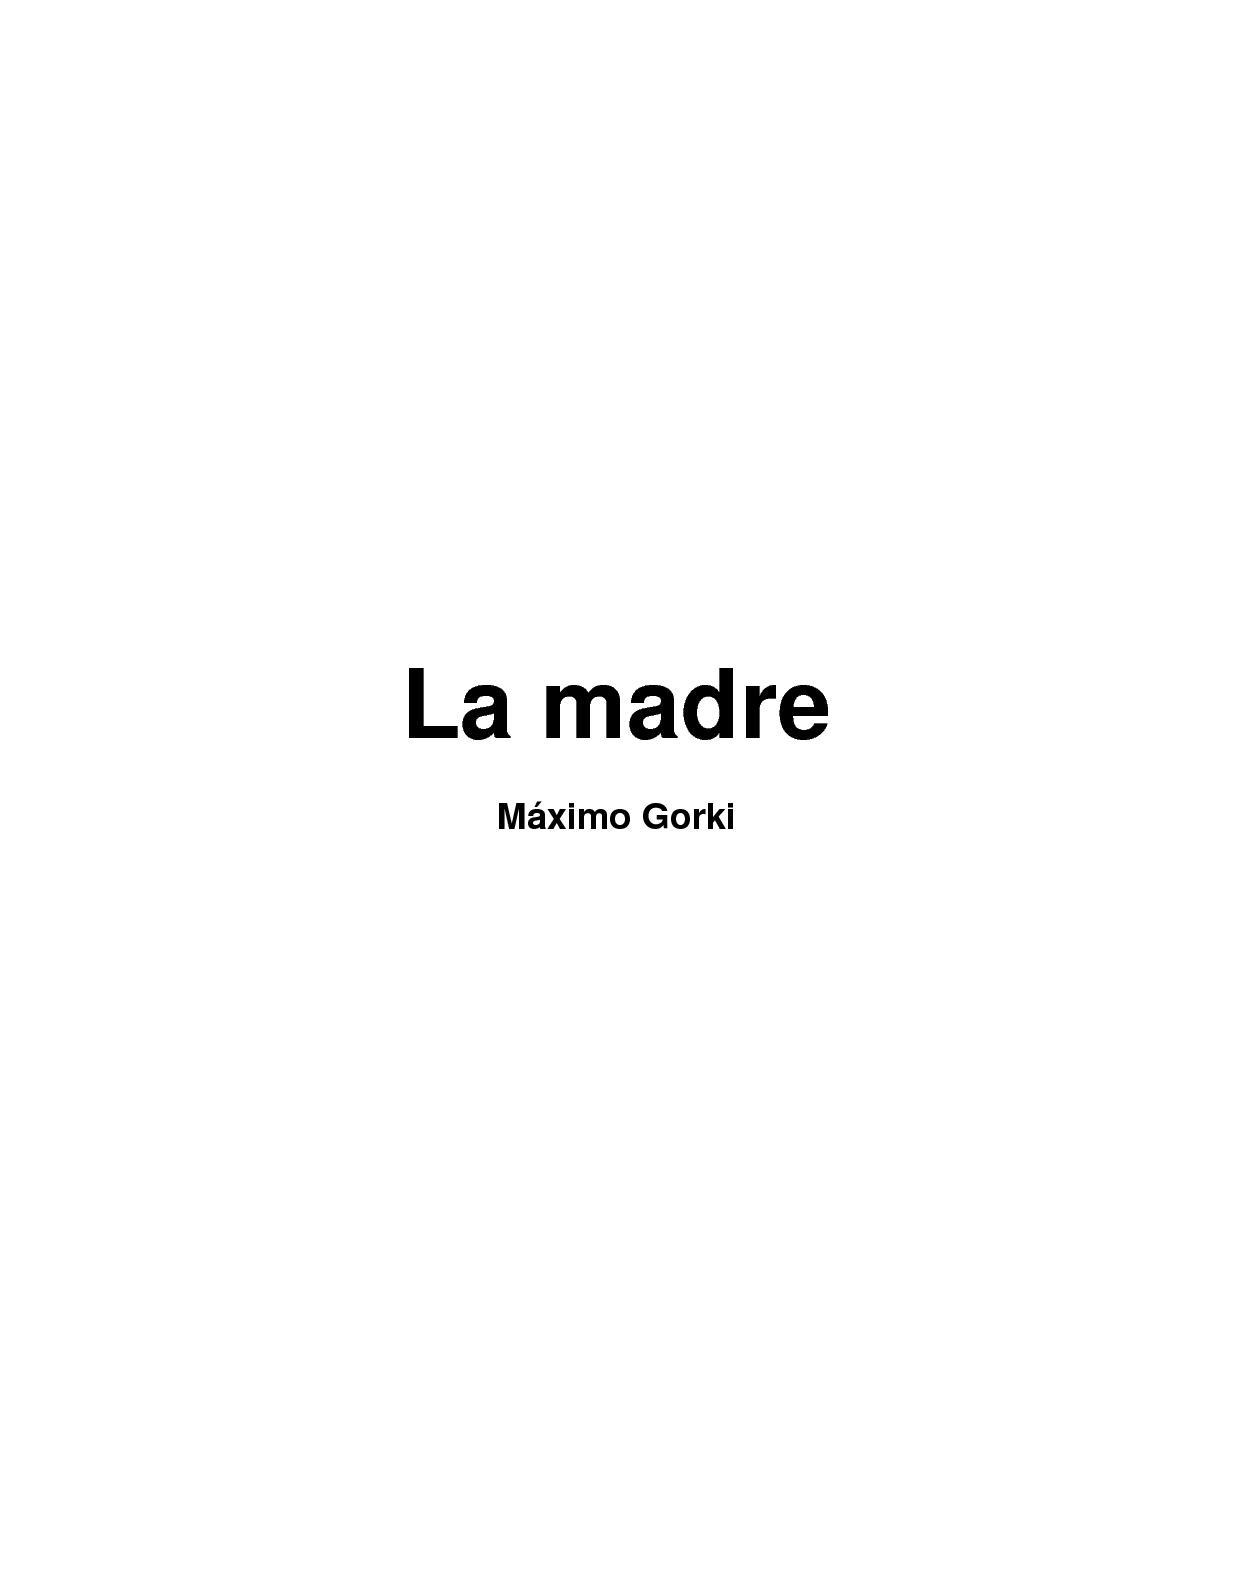 7a60c9a1 Calaméo - MÁXIMO GORKI. LA MADRE